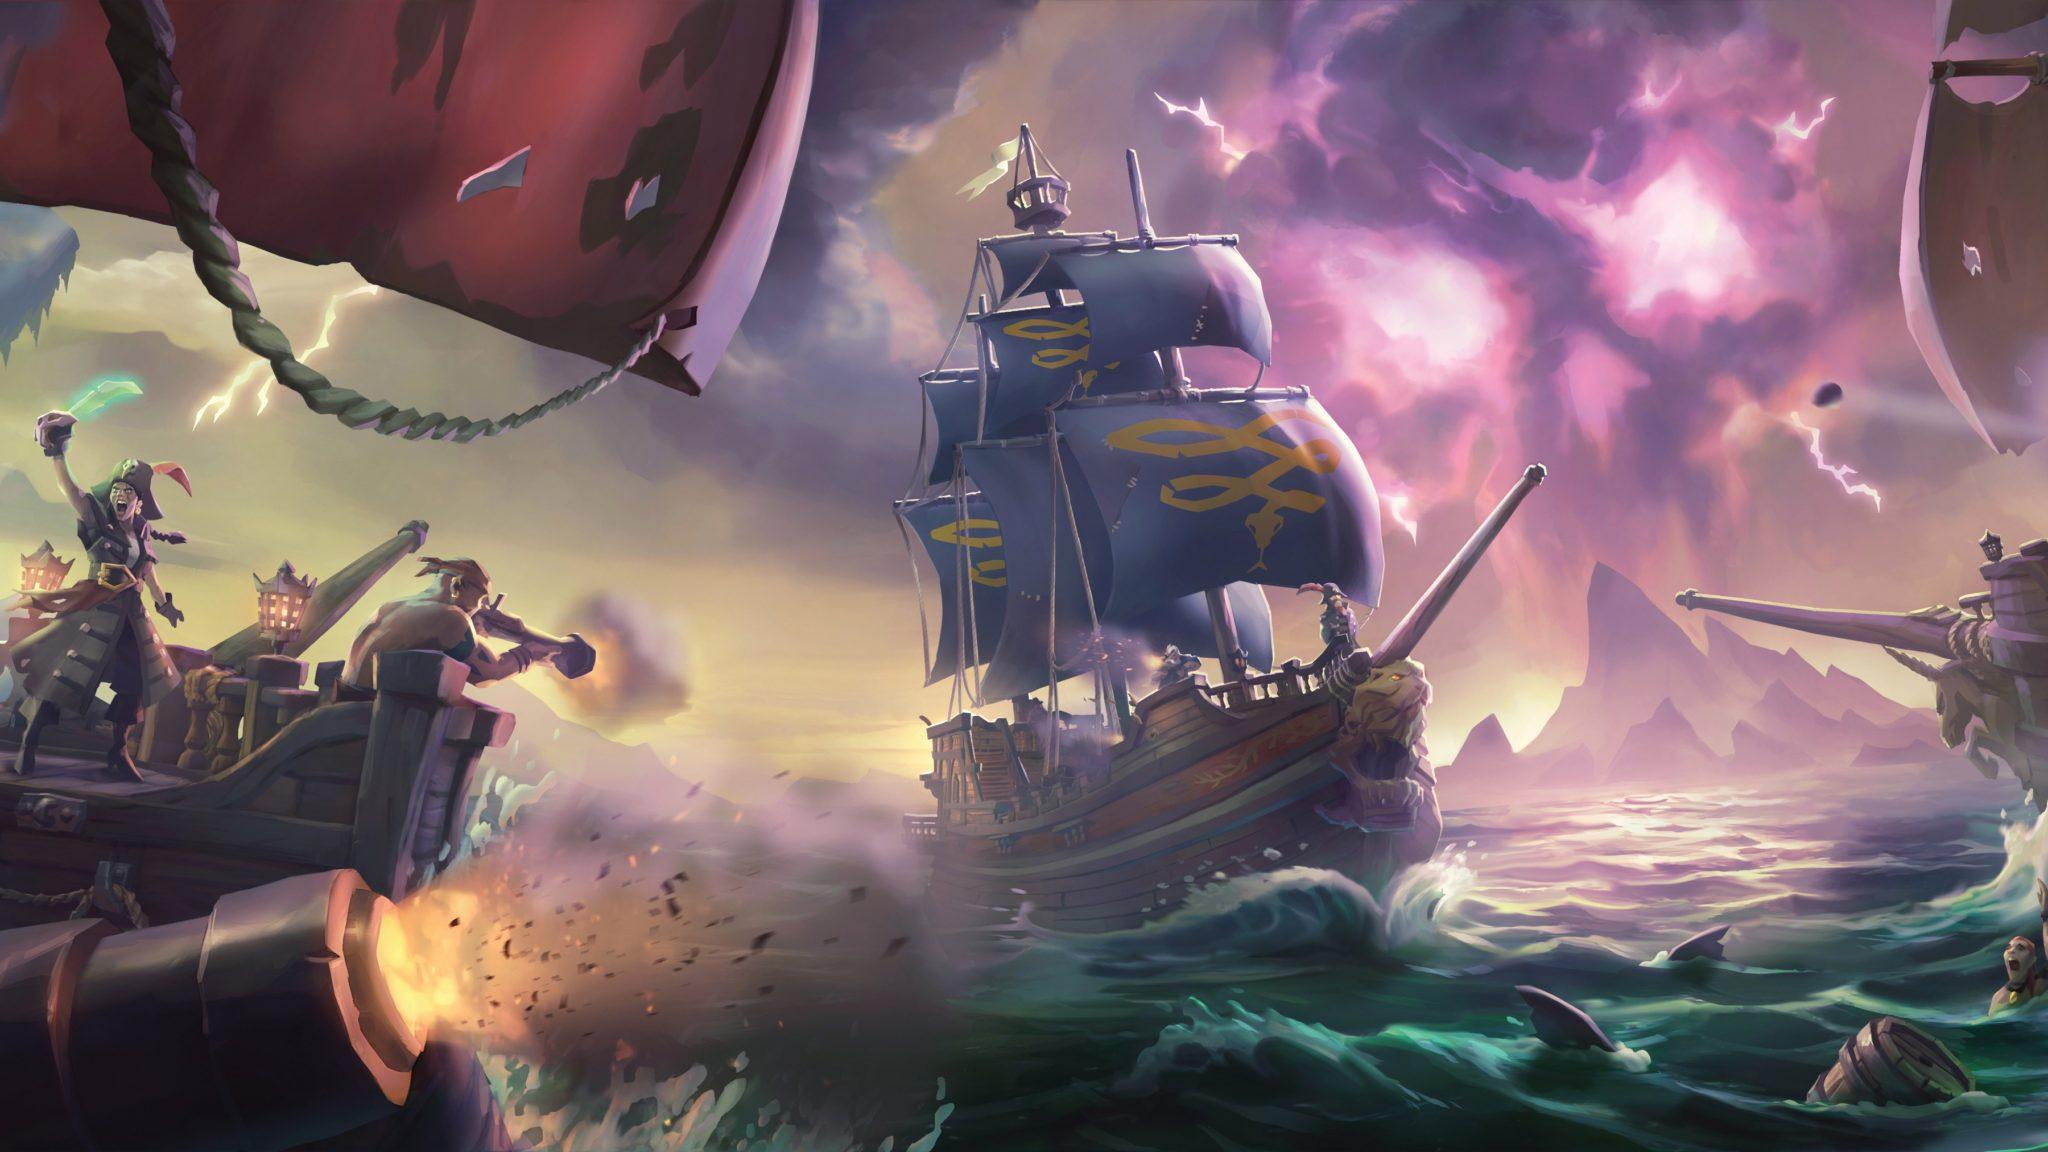 sea-of-thieves-video-game-desktop-wallpaper-62599-64572-hd-wallpapers